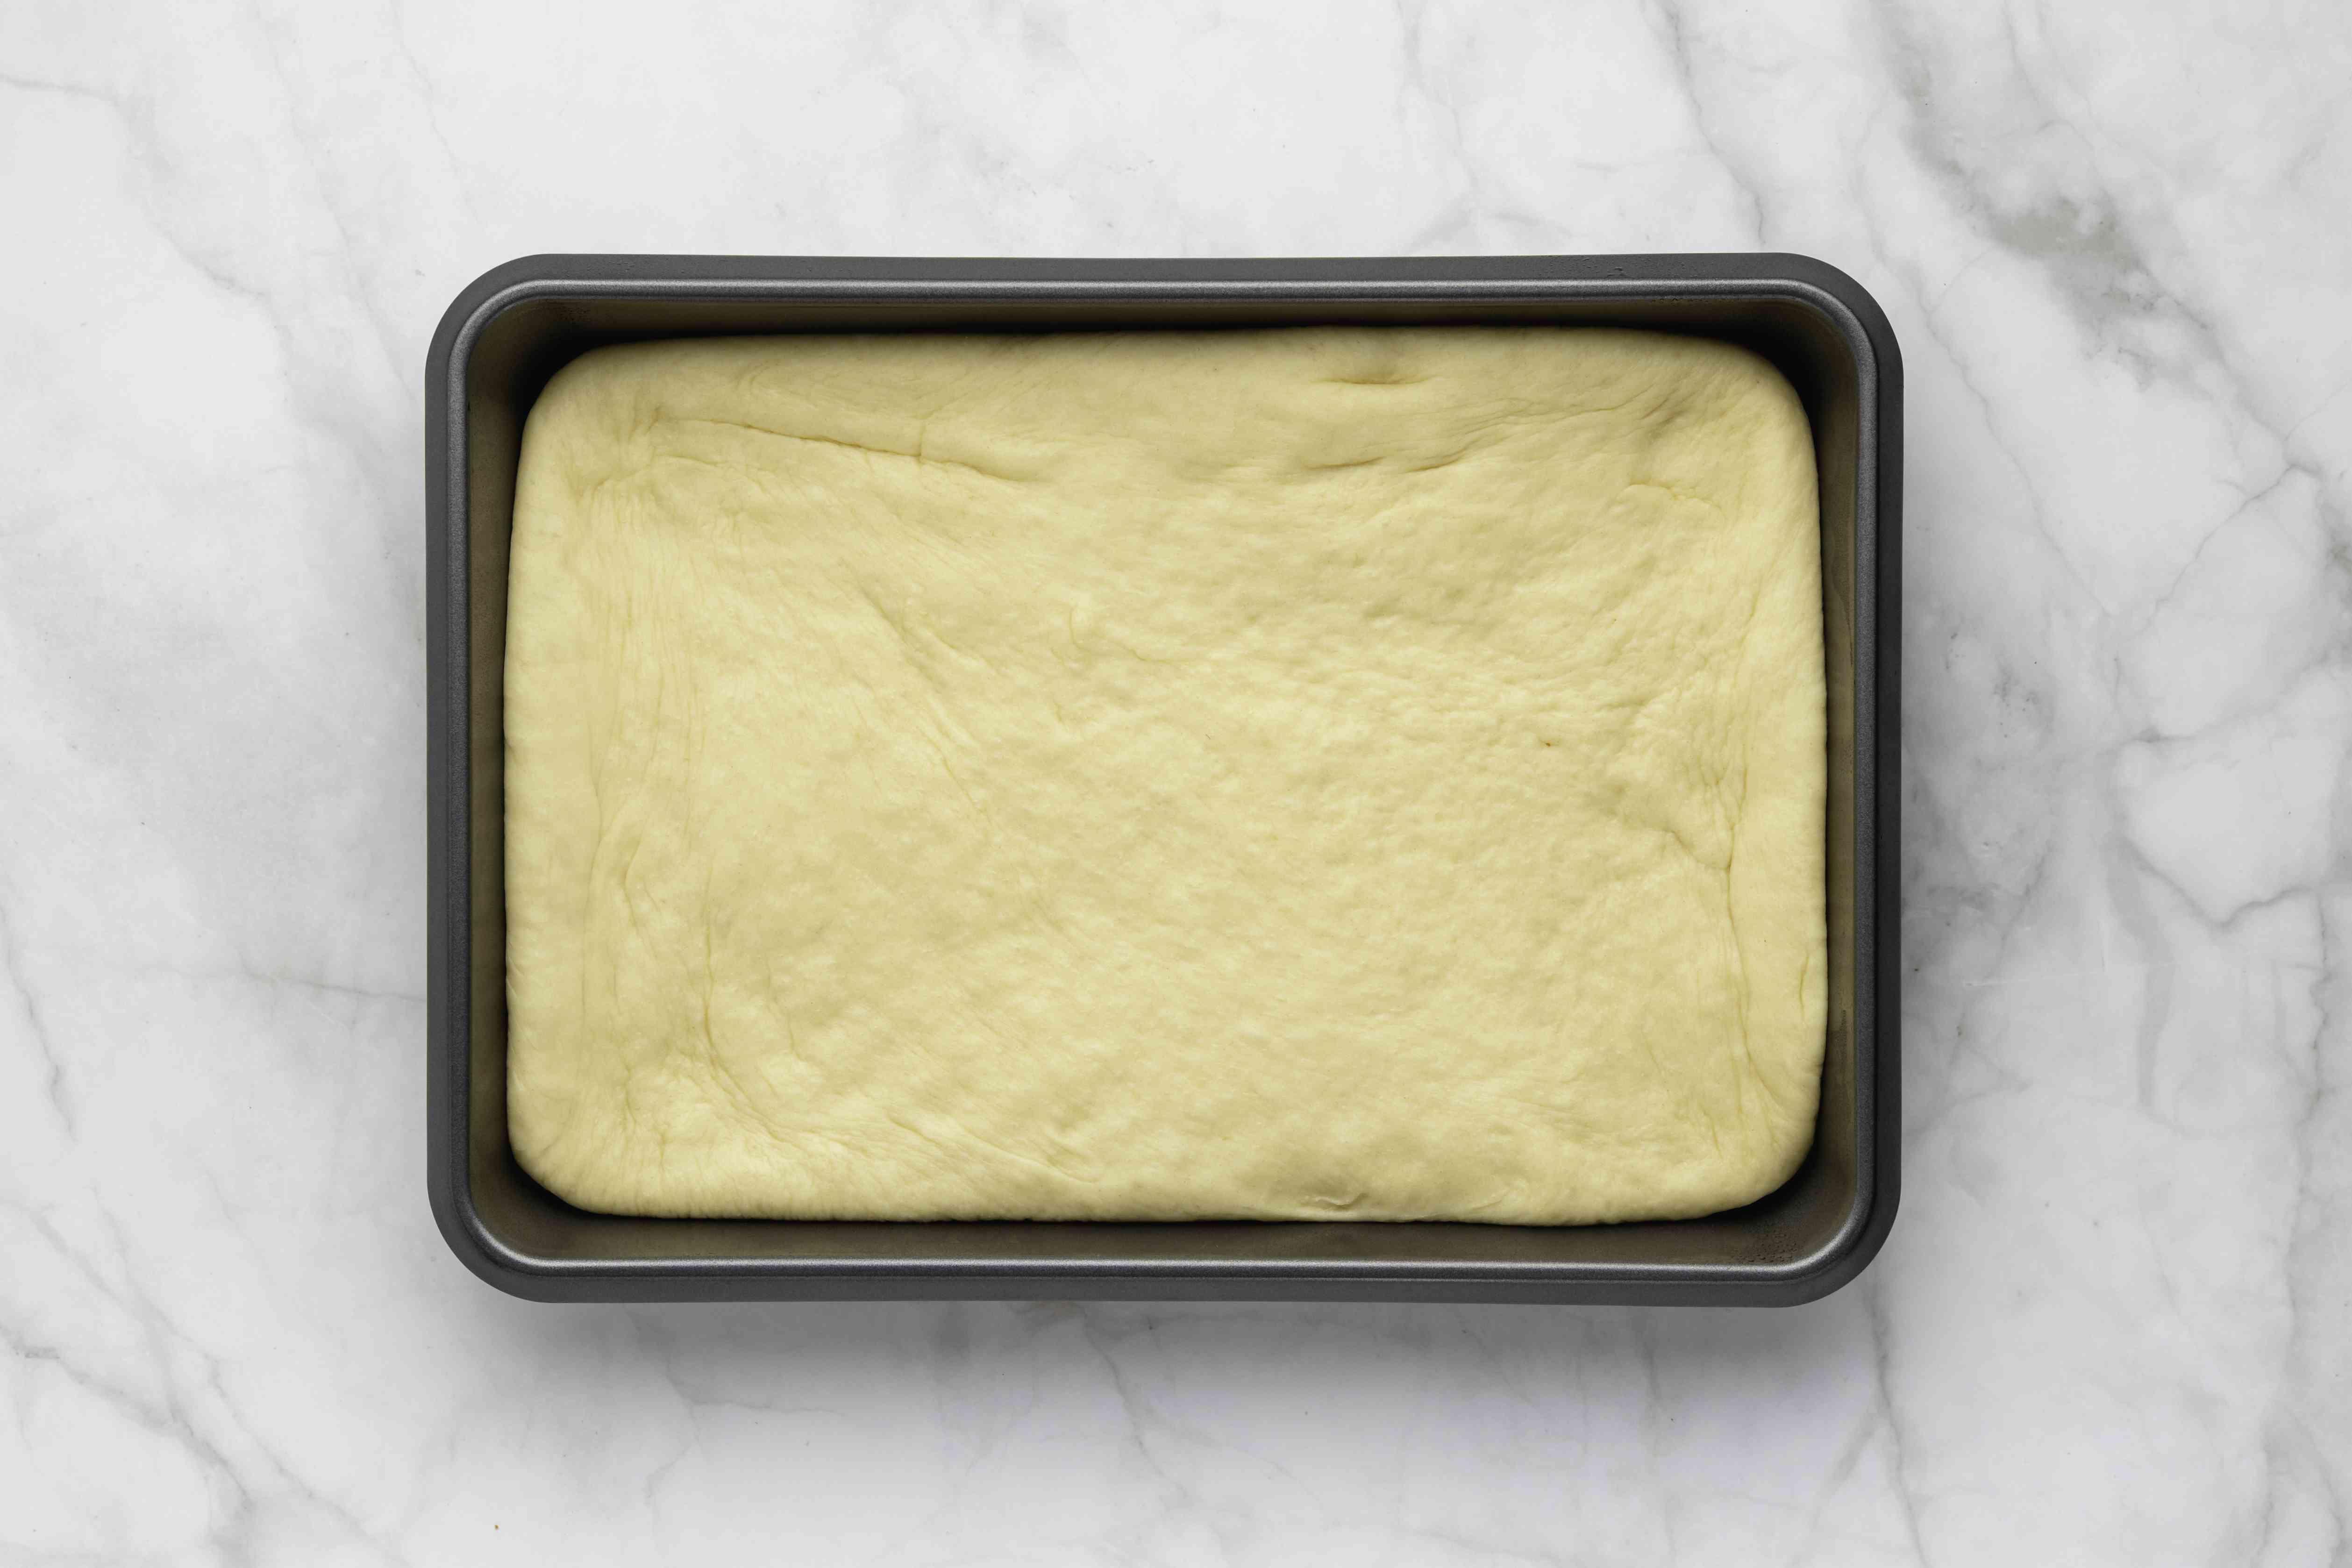 cake dough in a baking pan